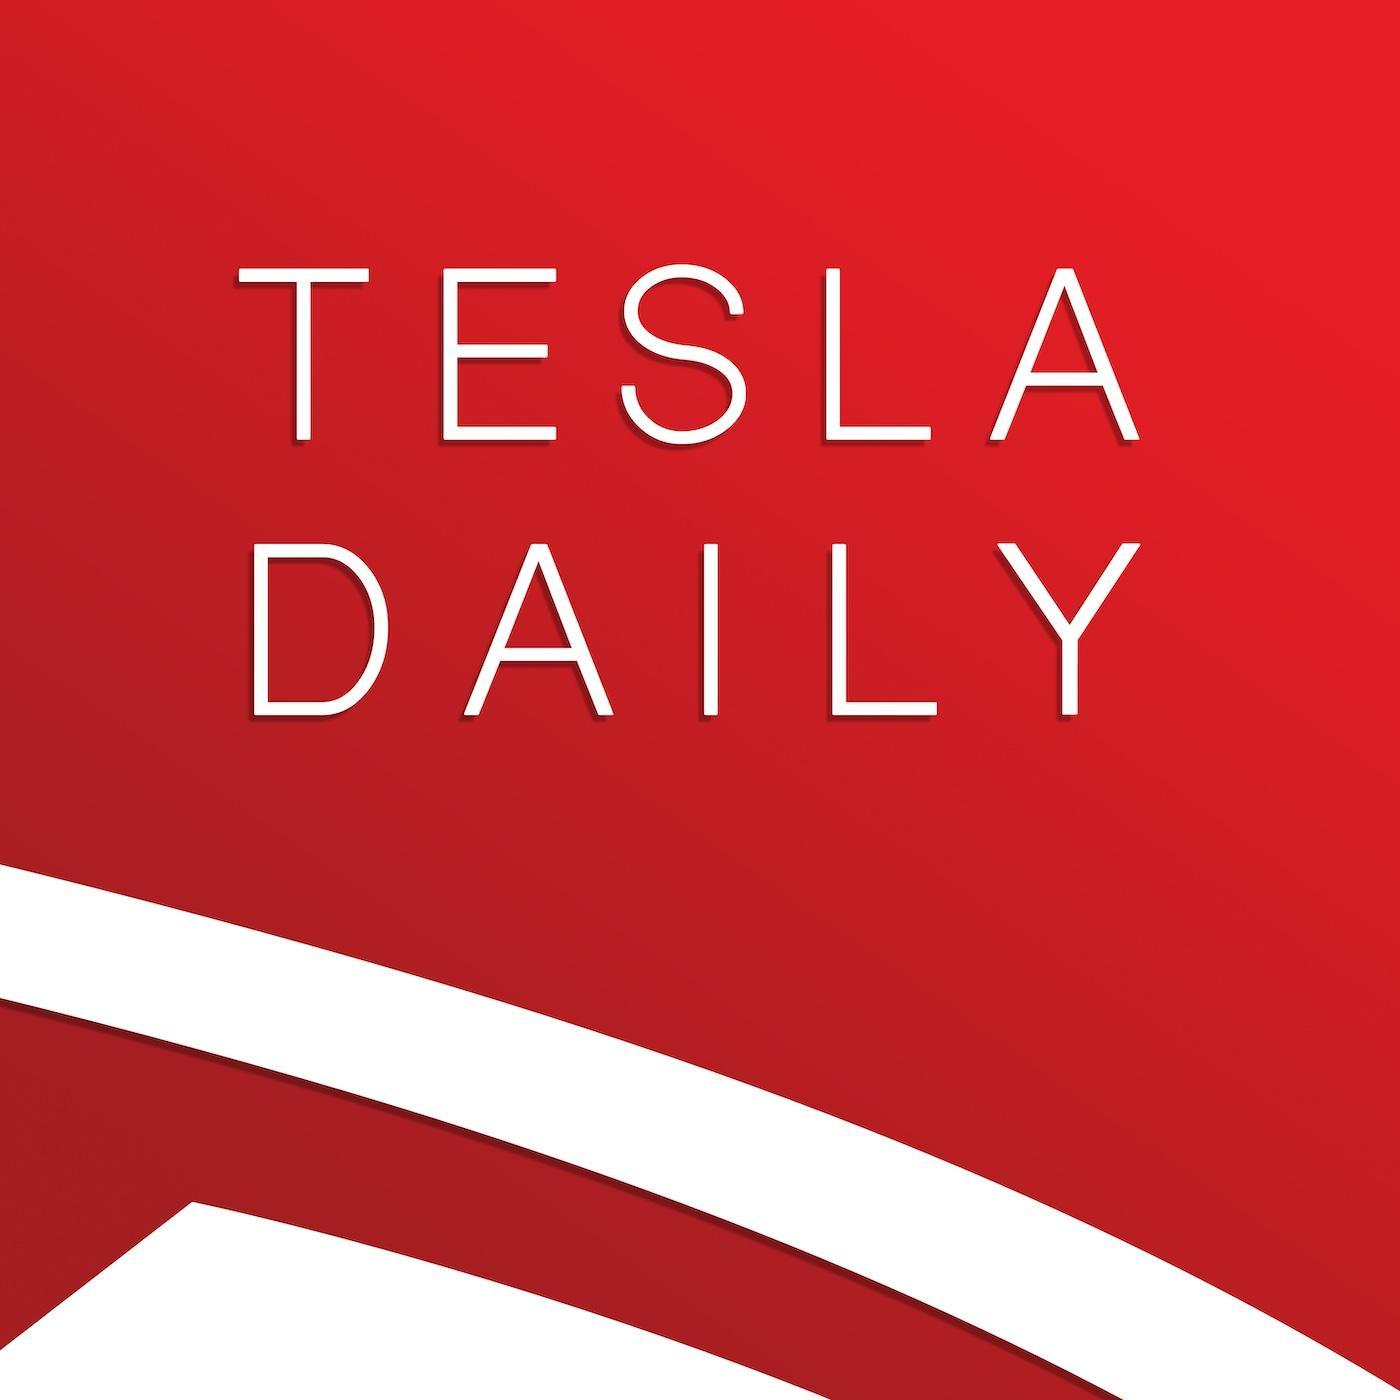 Elon Musk Joins Joe Rogan for 3-Hour Interview, Edmunds Releases EV Range Test (02.11.21)